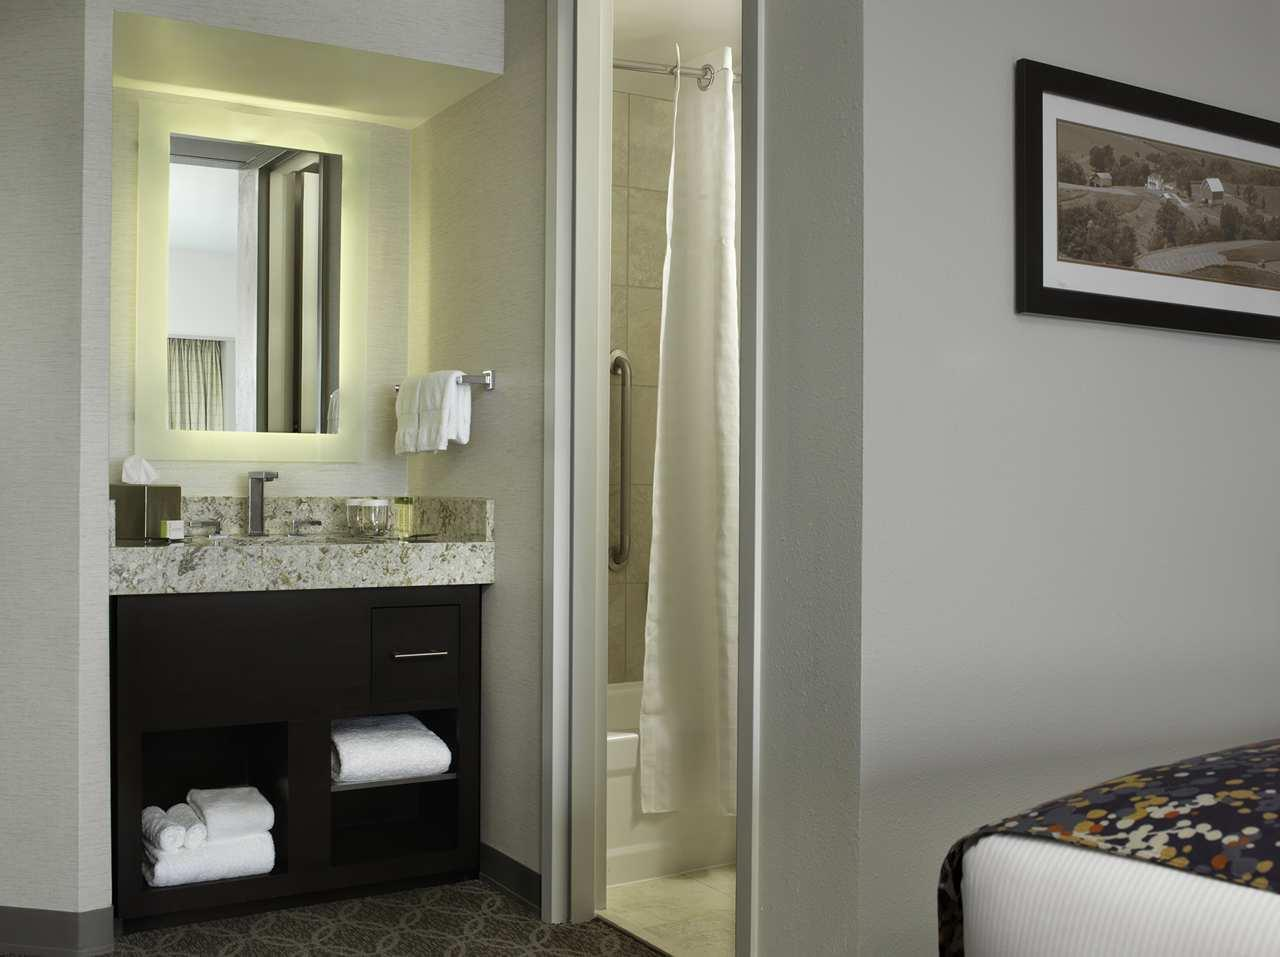 DoubleTree by Hilton Hotel Cedar Rapids Convention Complex image 13